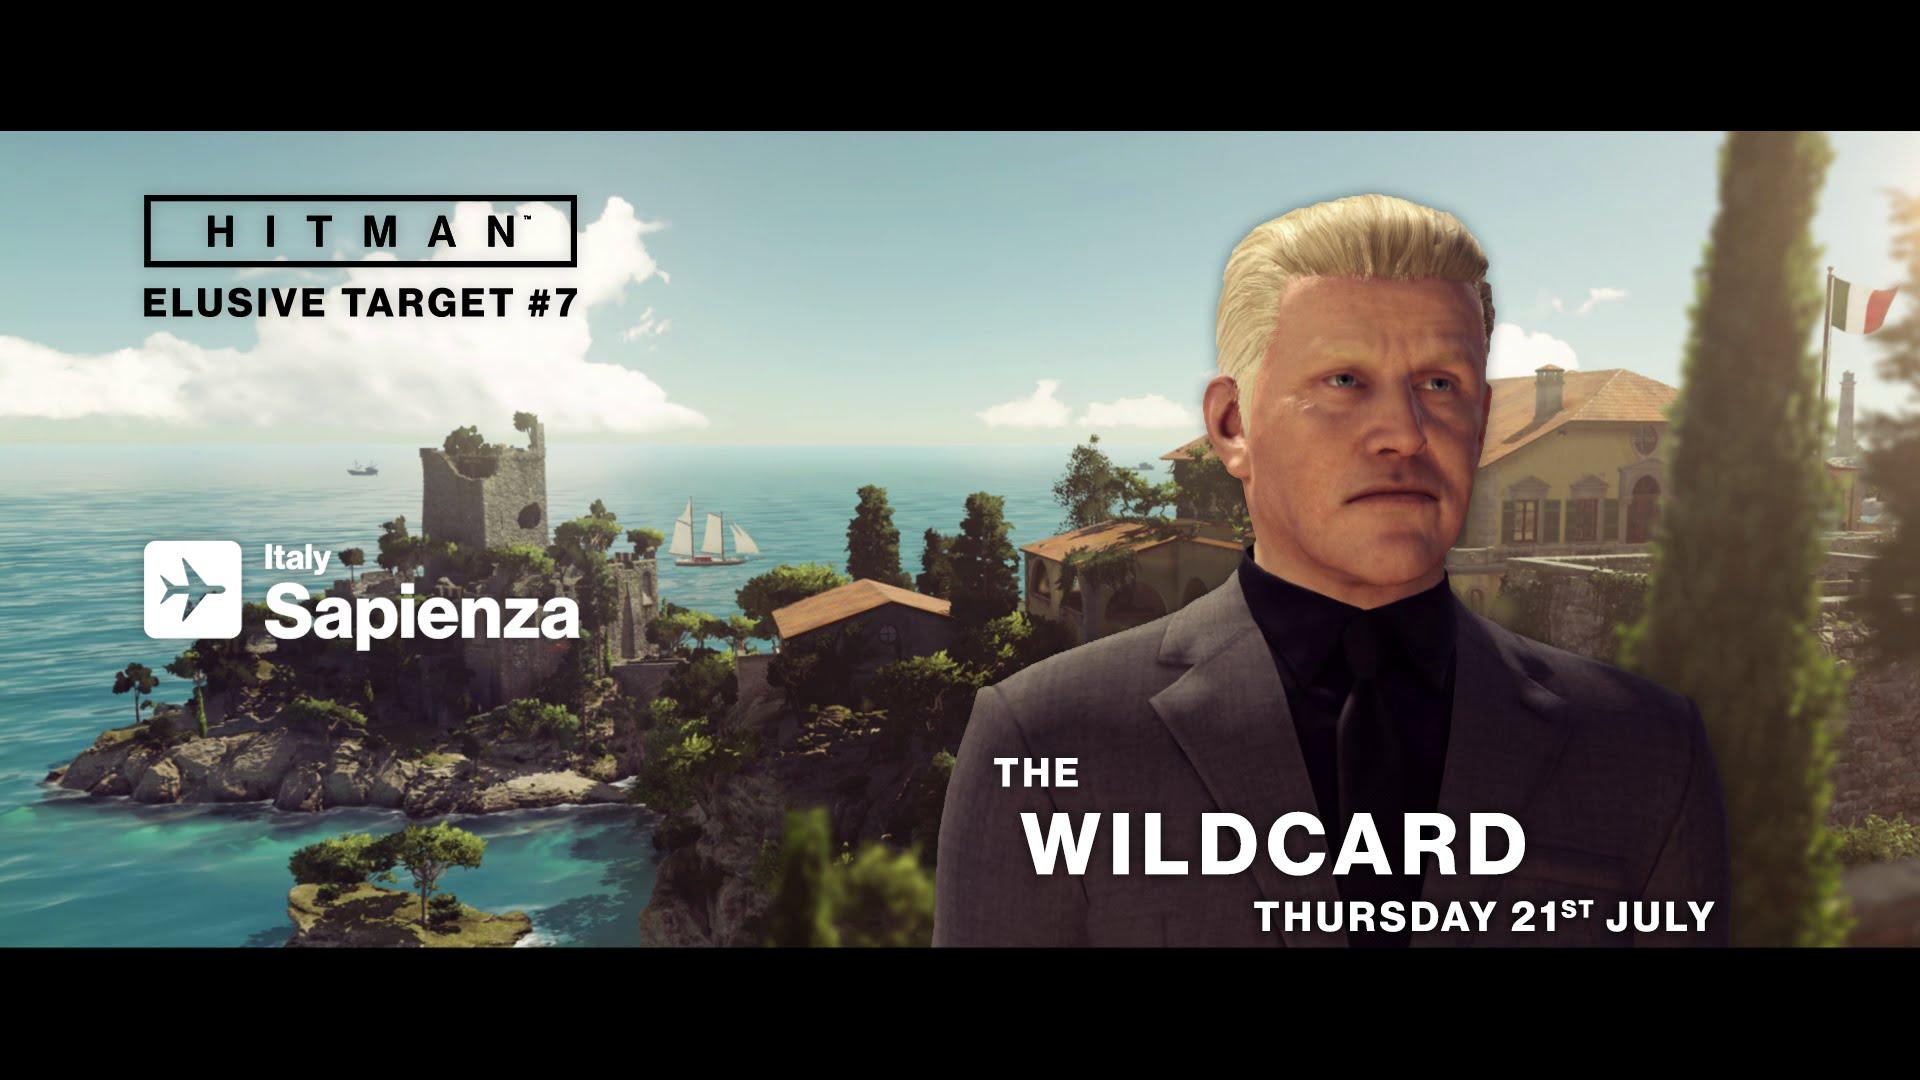 HITMAN Elusive Target #7 - The WildCard (Gary Busey)